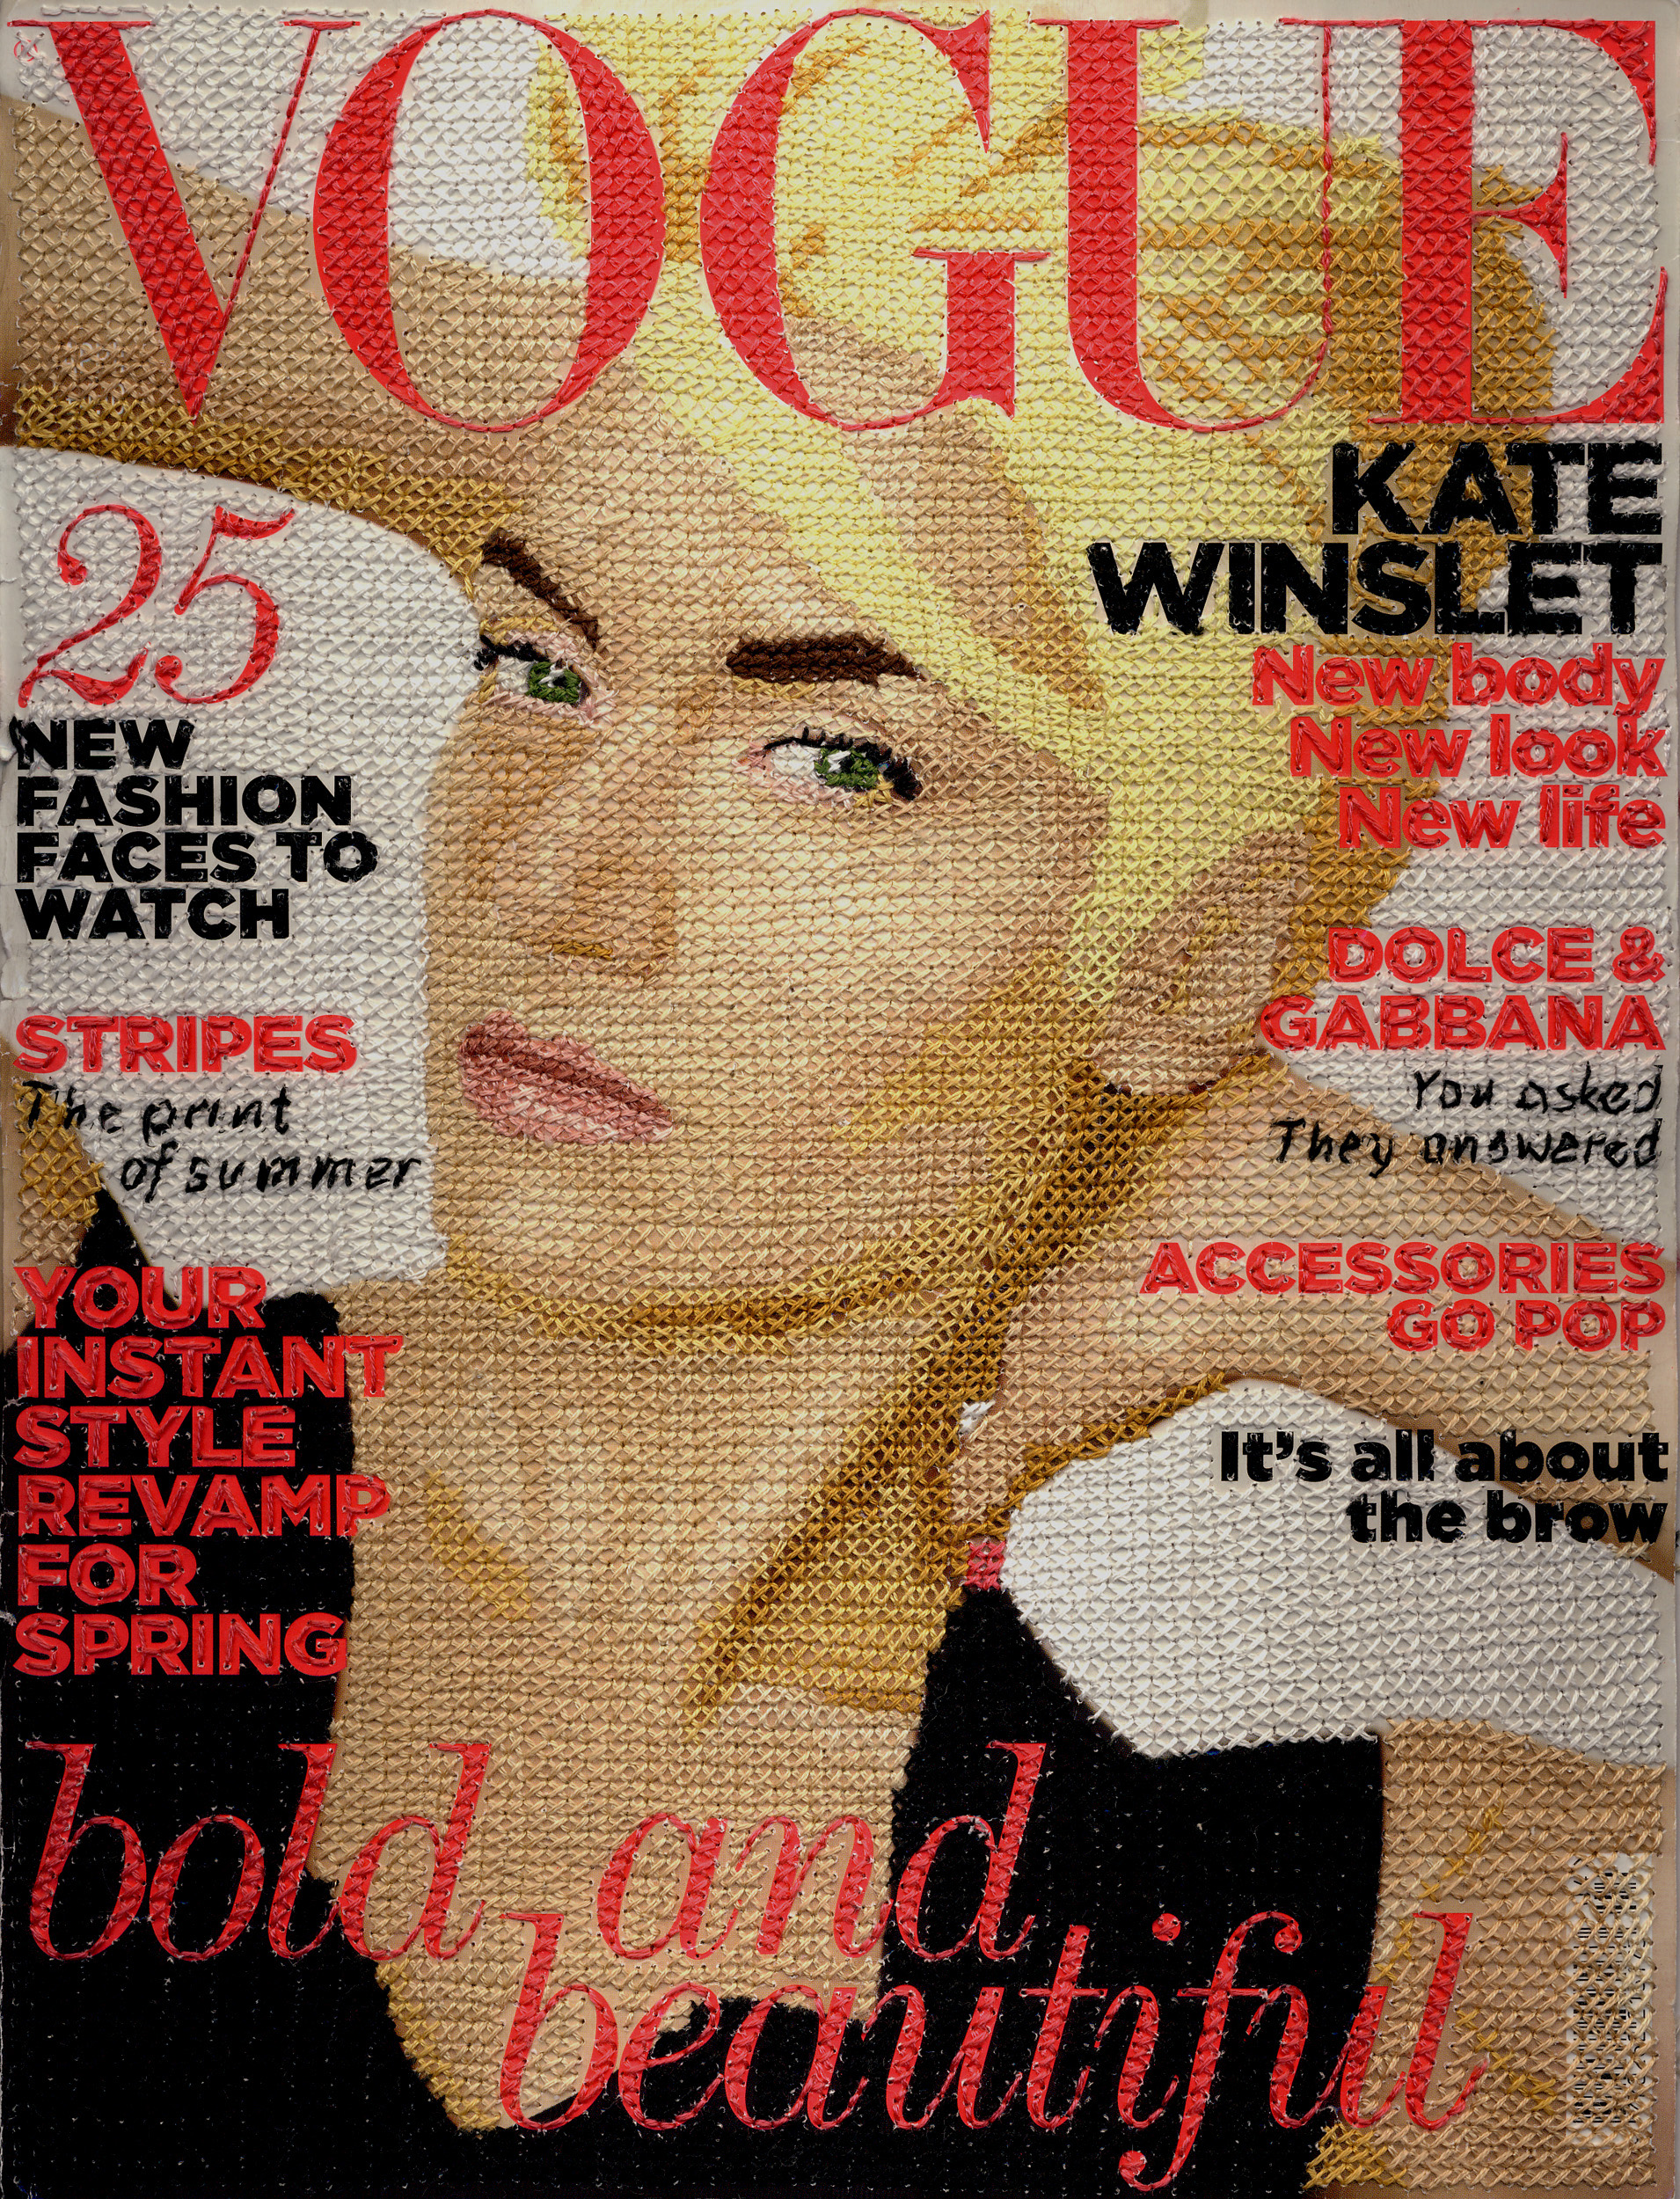 Vogue cover april 2011 front.jpg